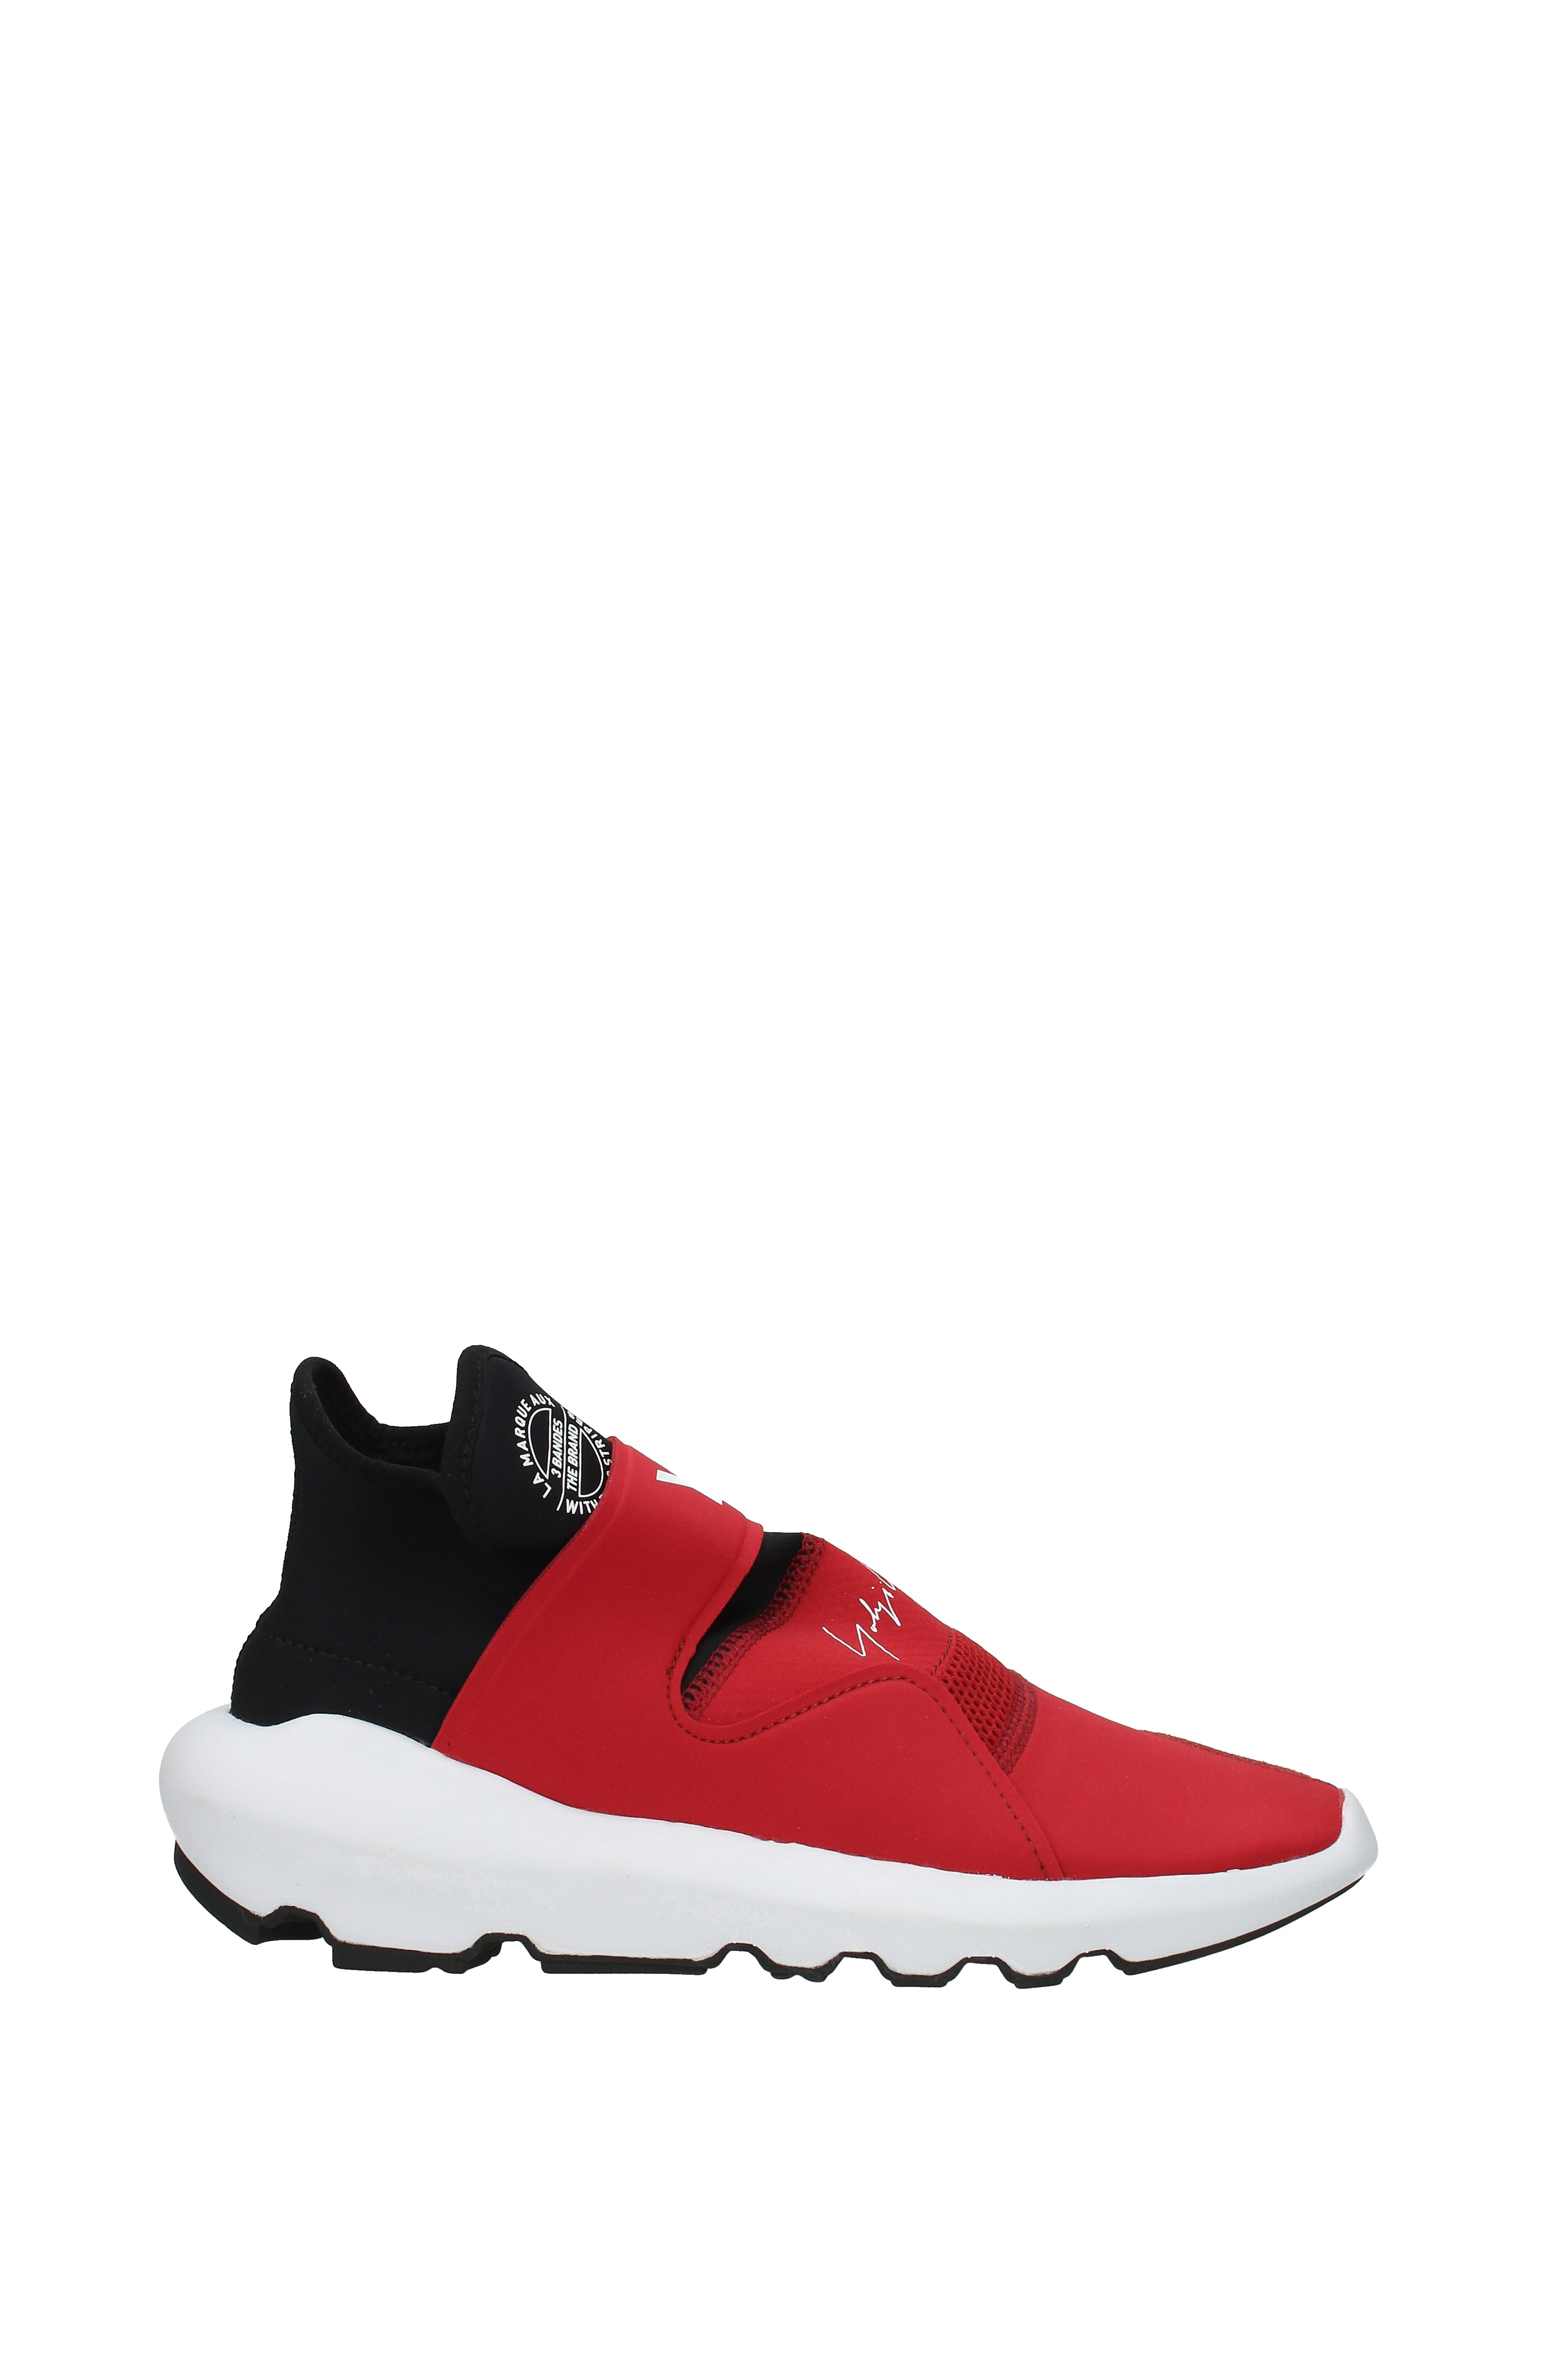 Sneakers Sneakers Sneakers Y3 Yamamoto  suberou Herren - Stoff (SUBEROUAC71) 9c1492